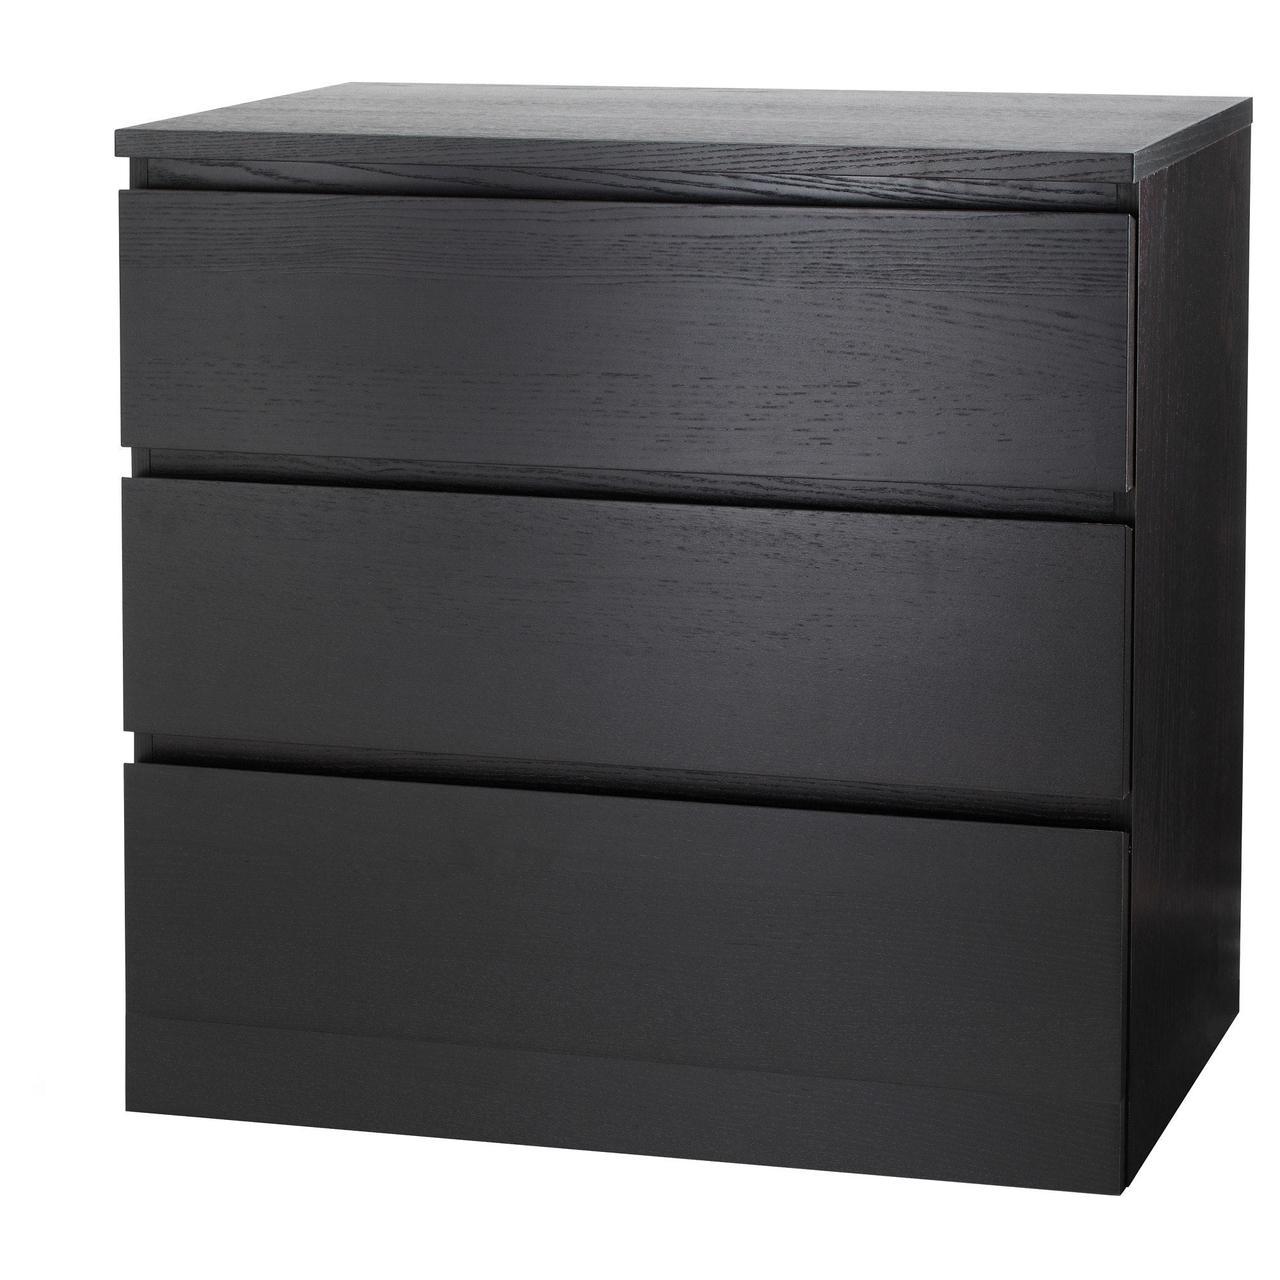 Комод с 3 ящиками IKEA MALM 204.035.57